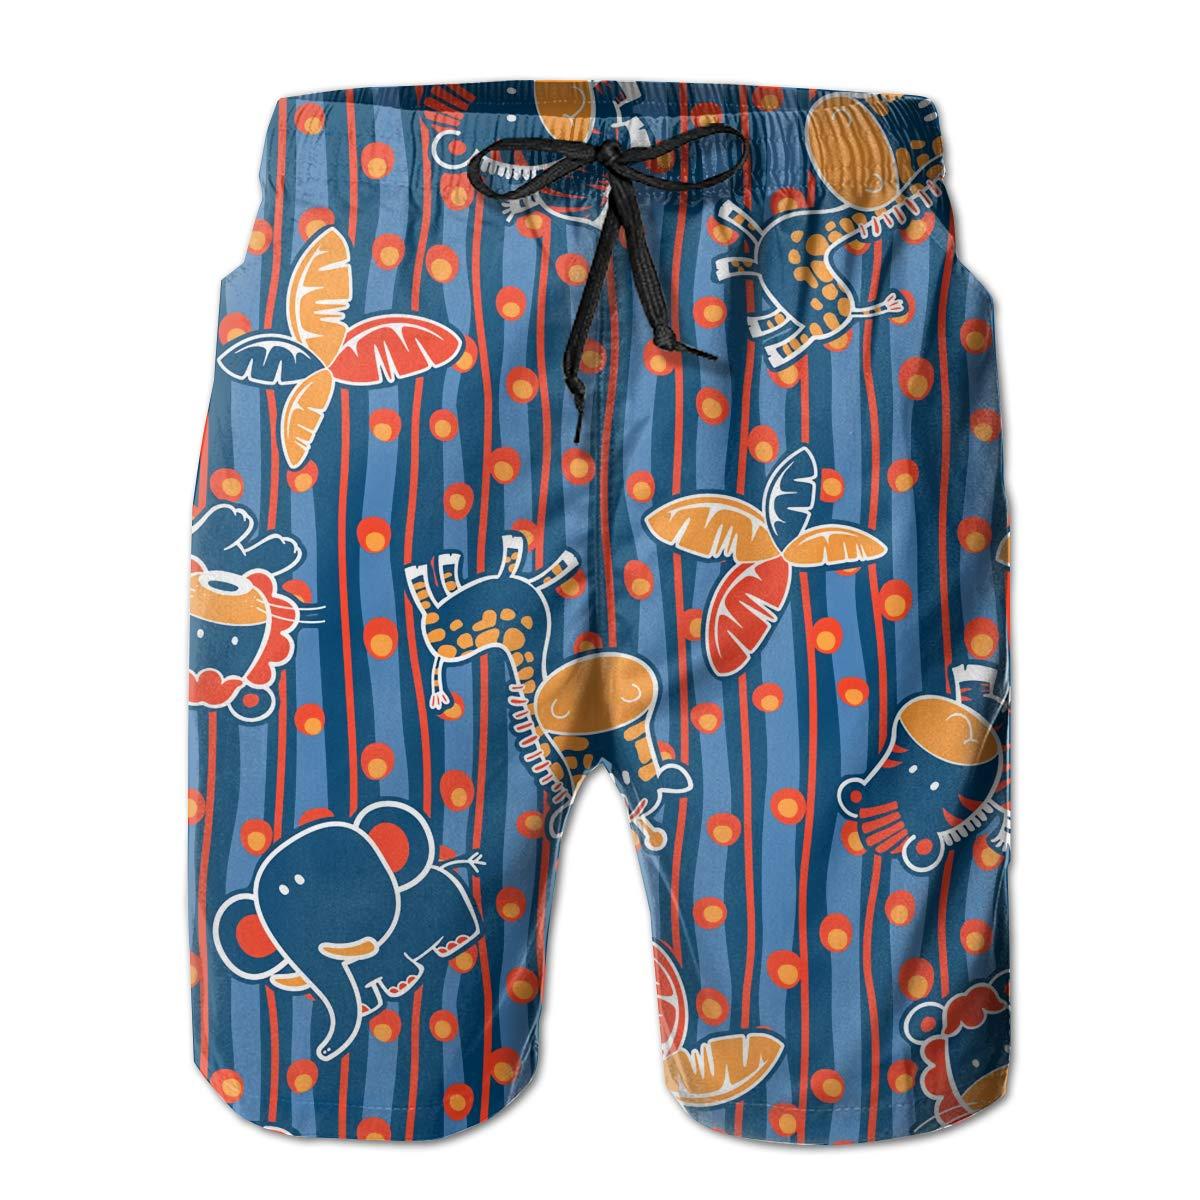 SARA NELL Mens Swim Trunks Cute Jungle Animals and Leaves Polka Dot Surfing Beach Board Shorts Swimwear